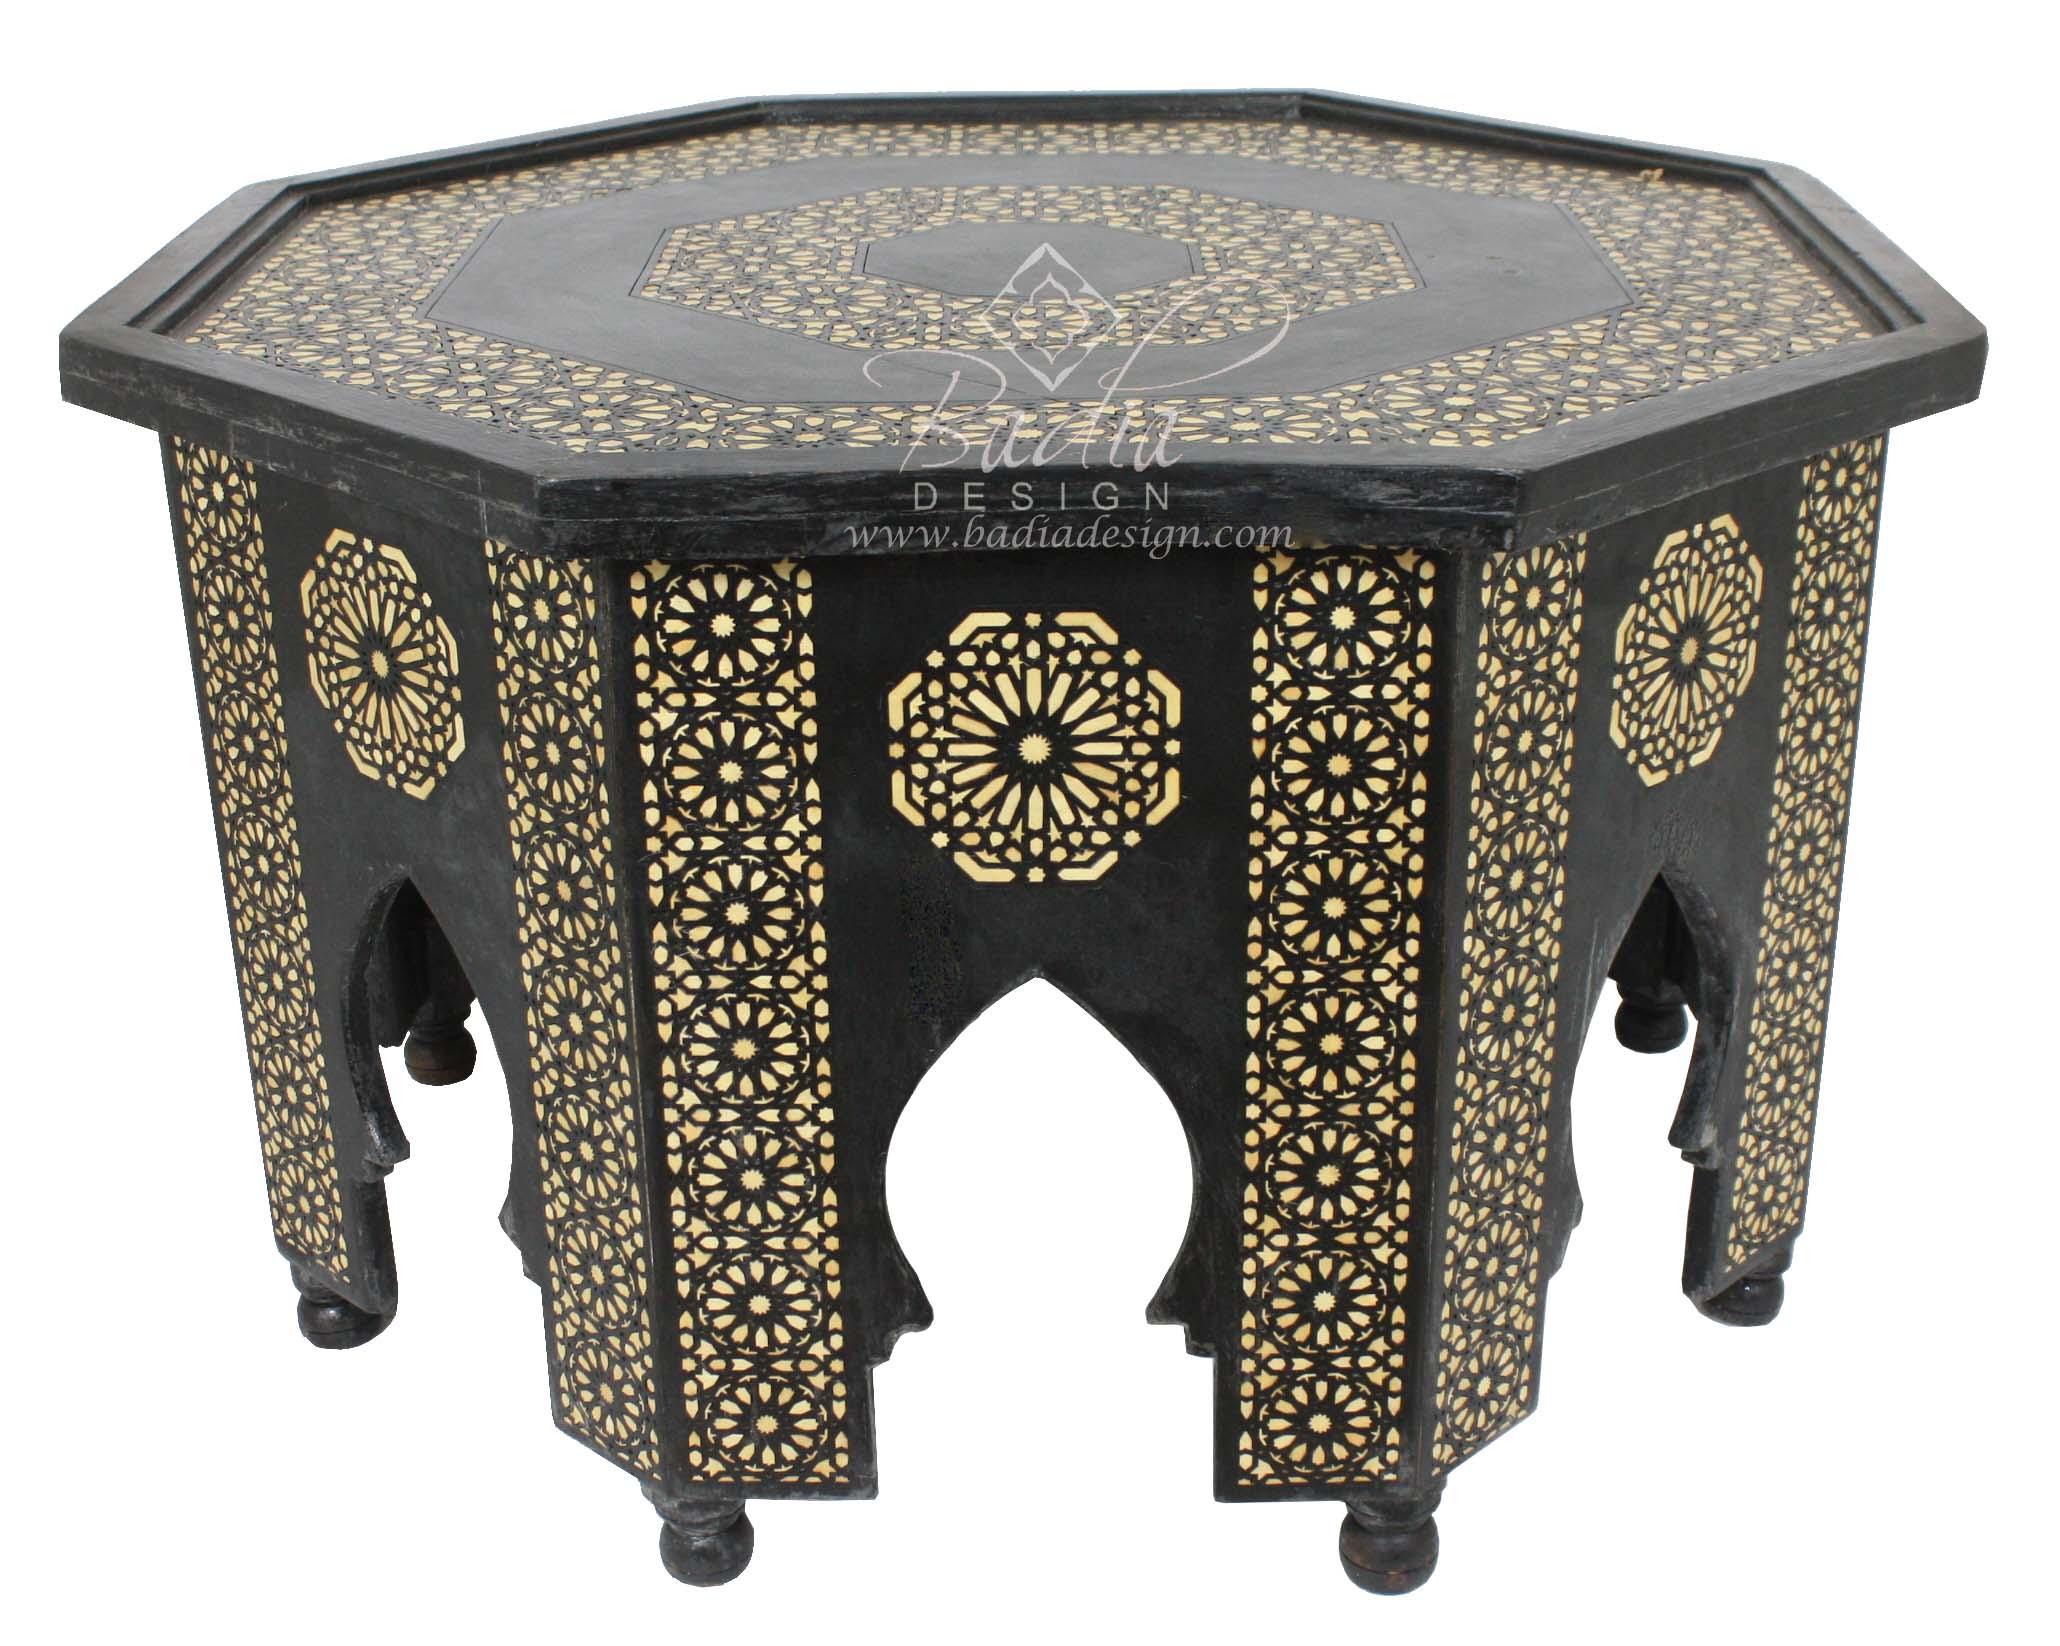 moroccan-octagon-shaped-camel-bone-coffee-table-mop-st094-1.jpg